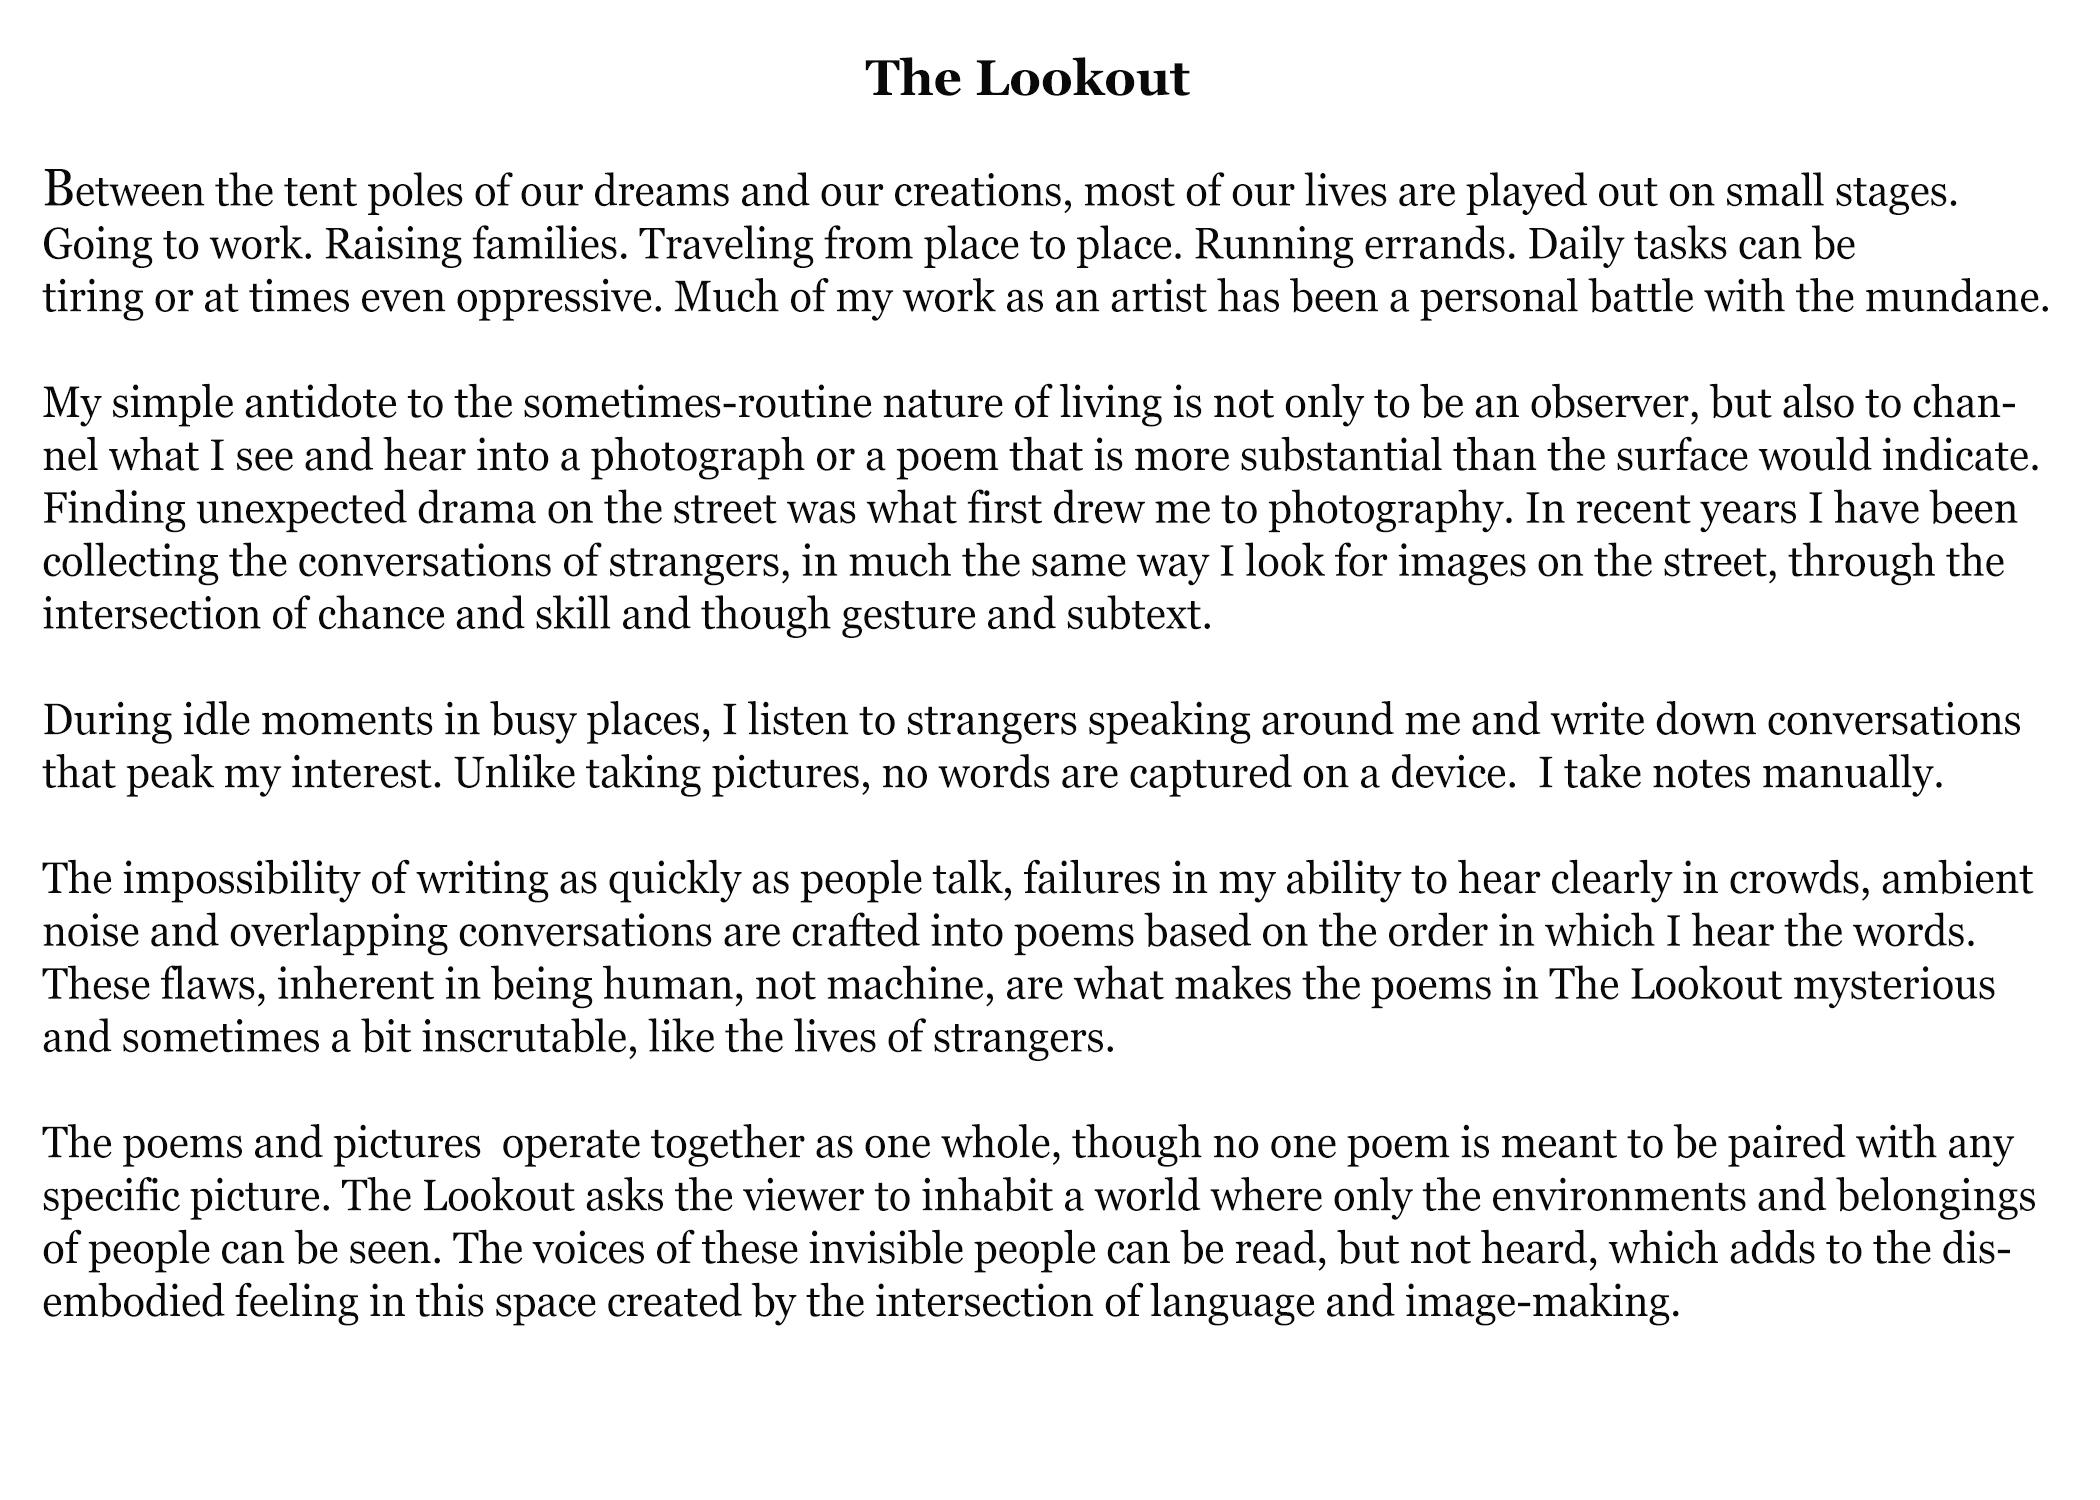 TheLookoutStatment.jpg